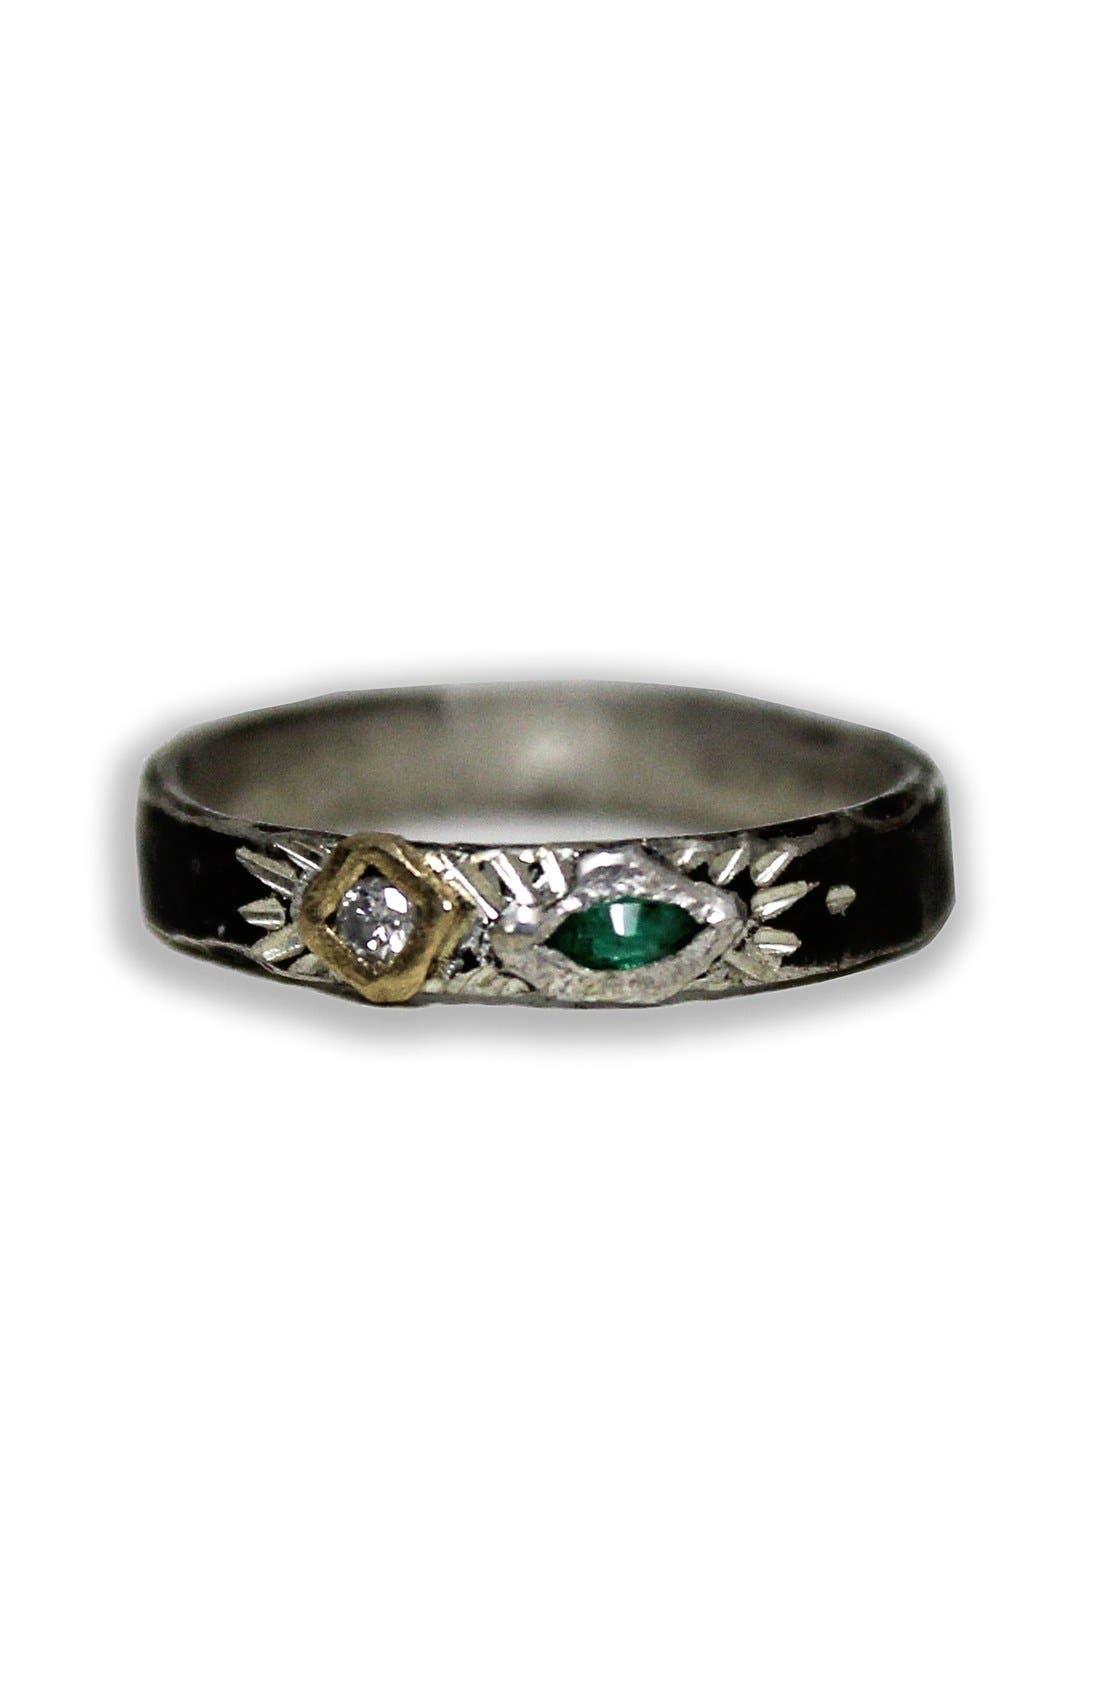 Main Image - Franny E Jewelry Diamond & Emerald Stacker Ring